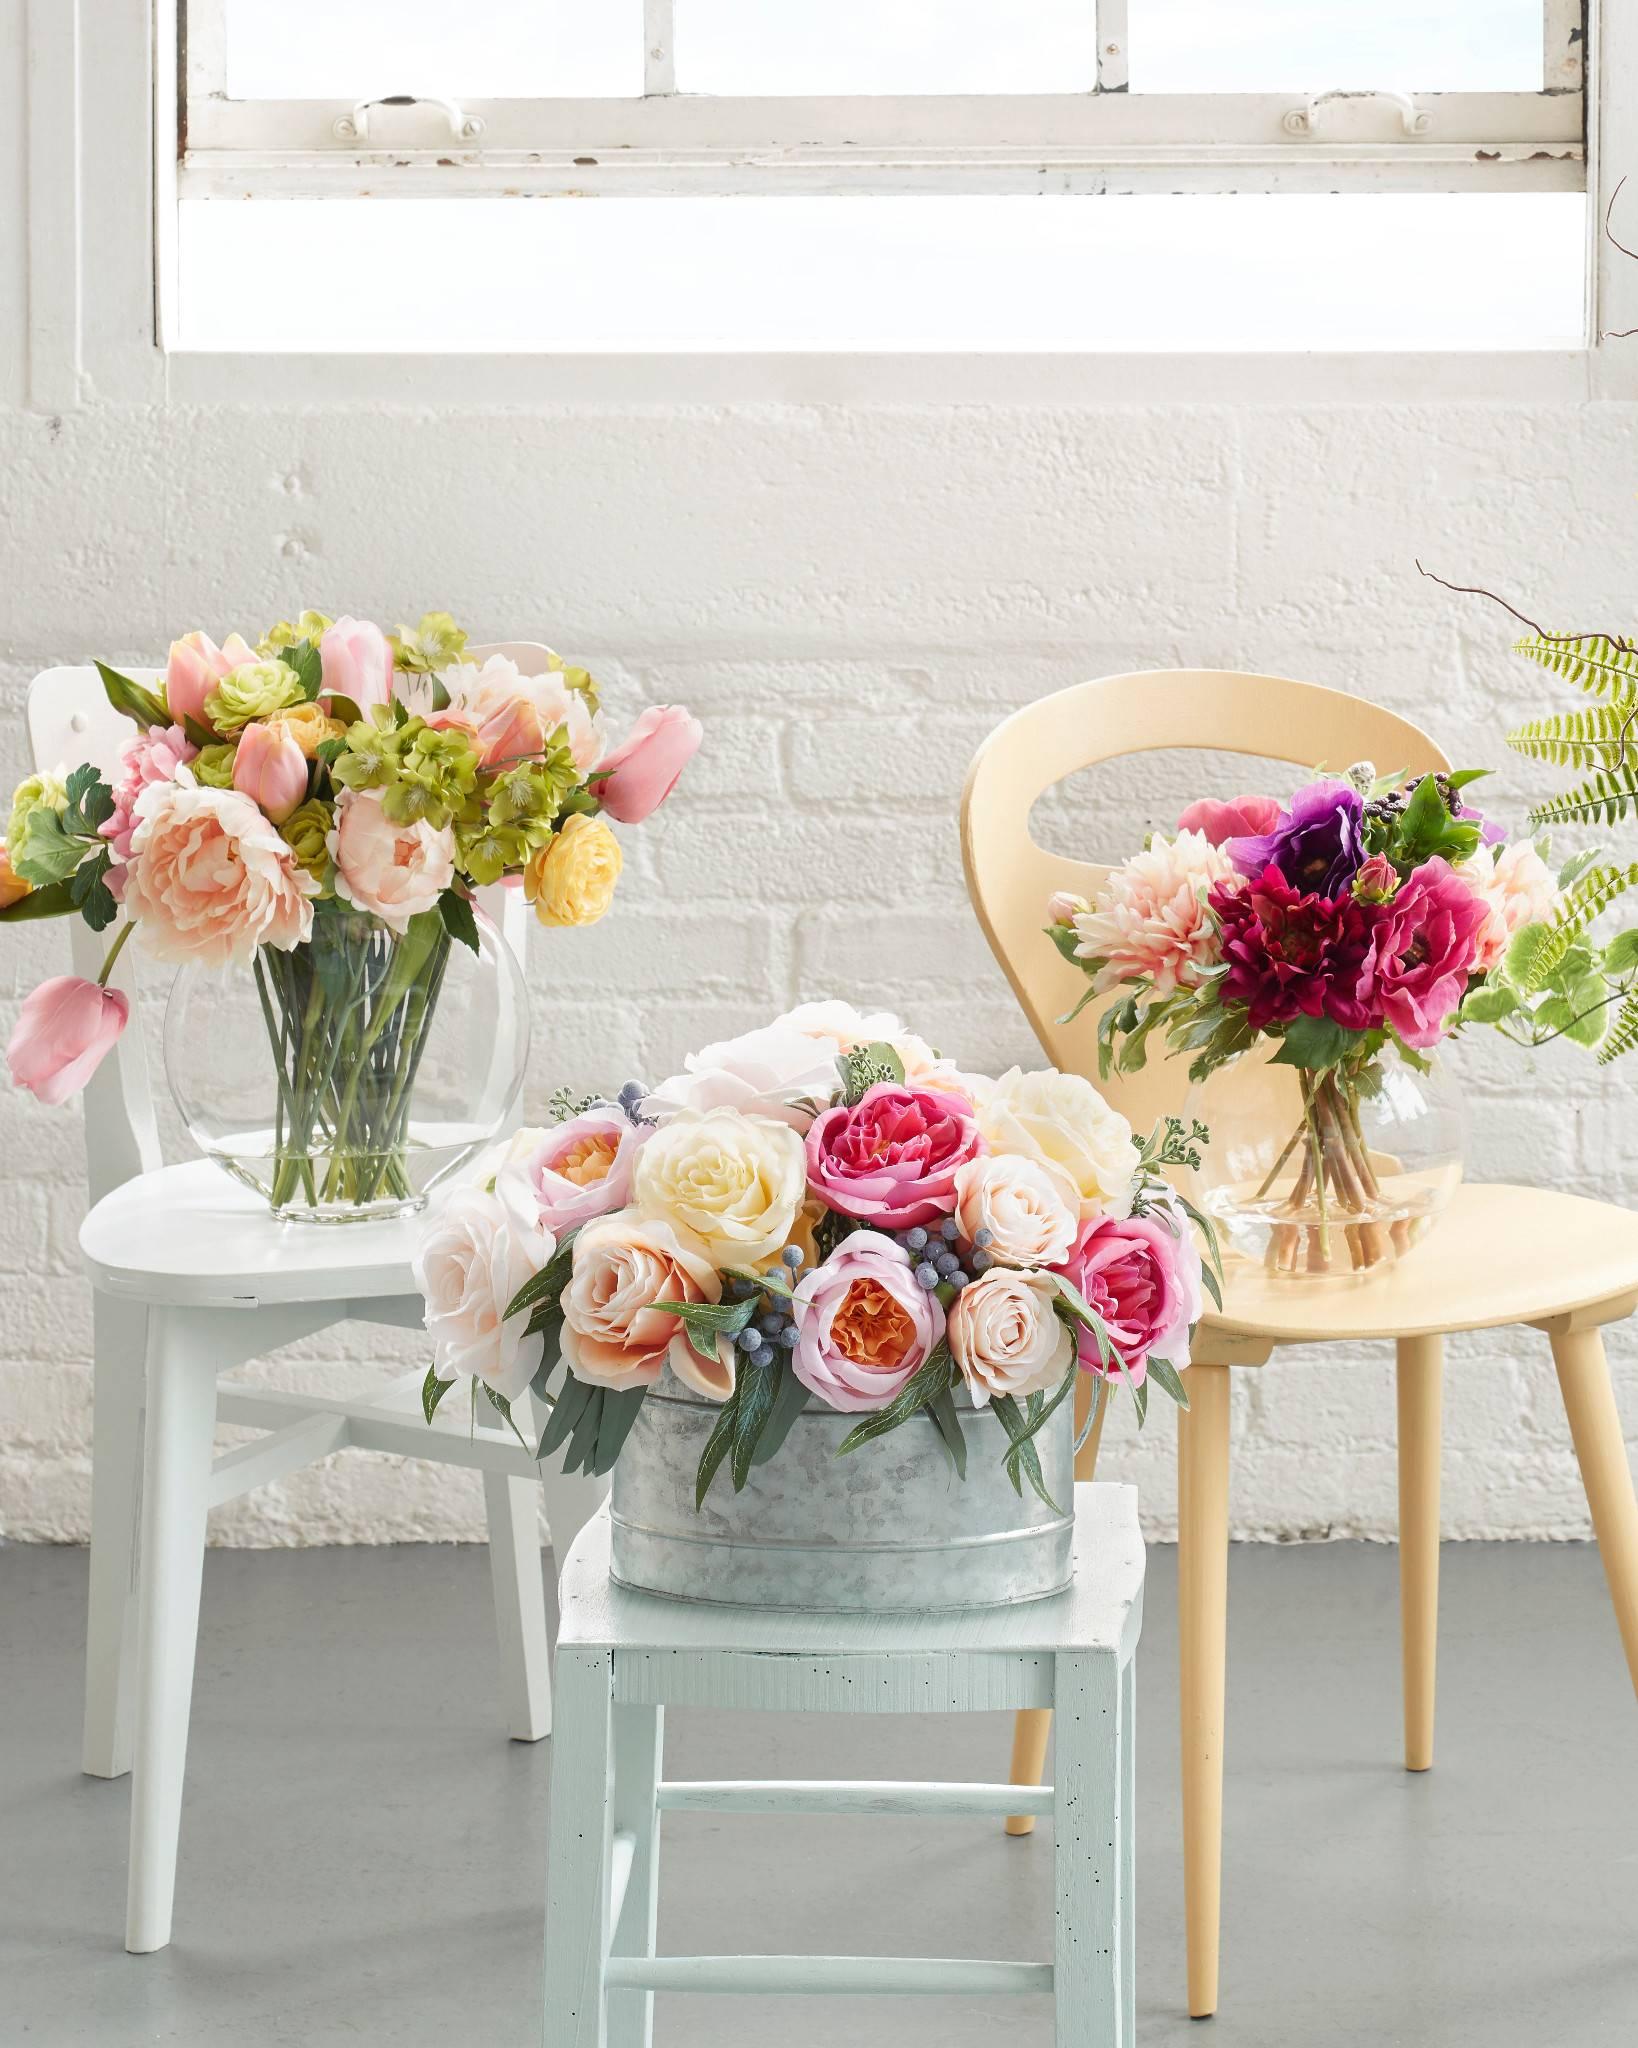 Balsam Hill Faux Floral Brittany Rose Arrangements